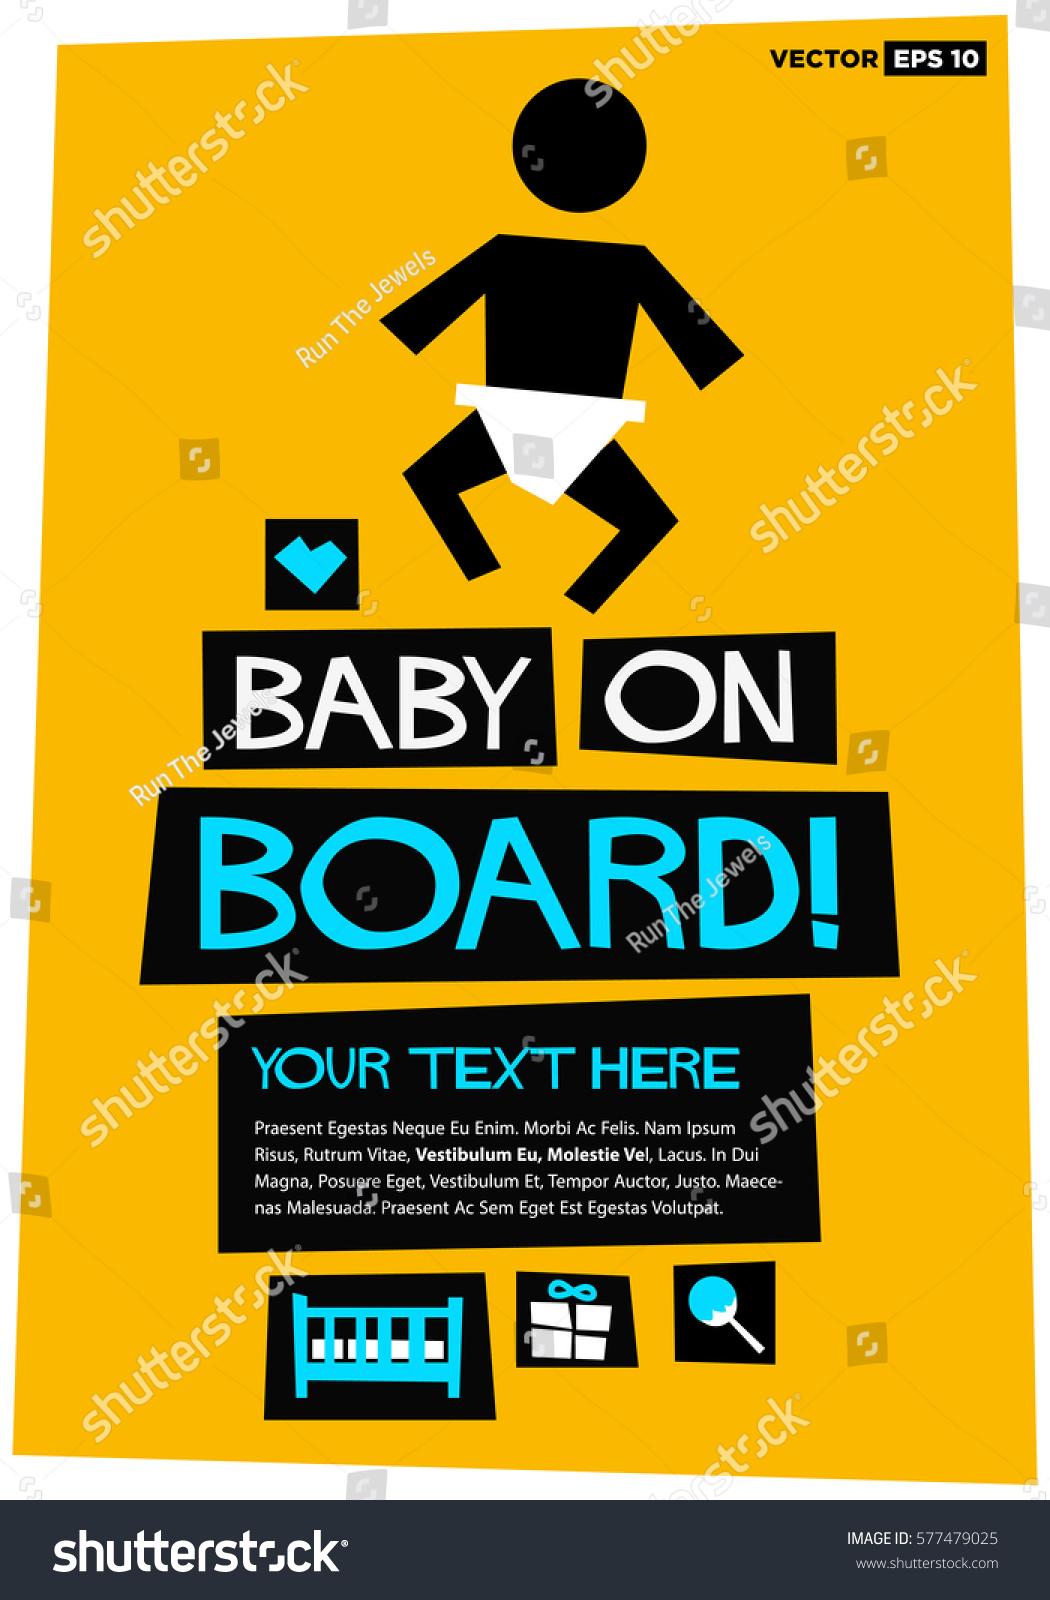 Baby On Board Flat Style Vector Stock Vector 577479025 - Shutterstock